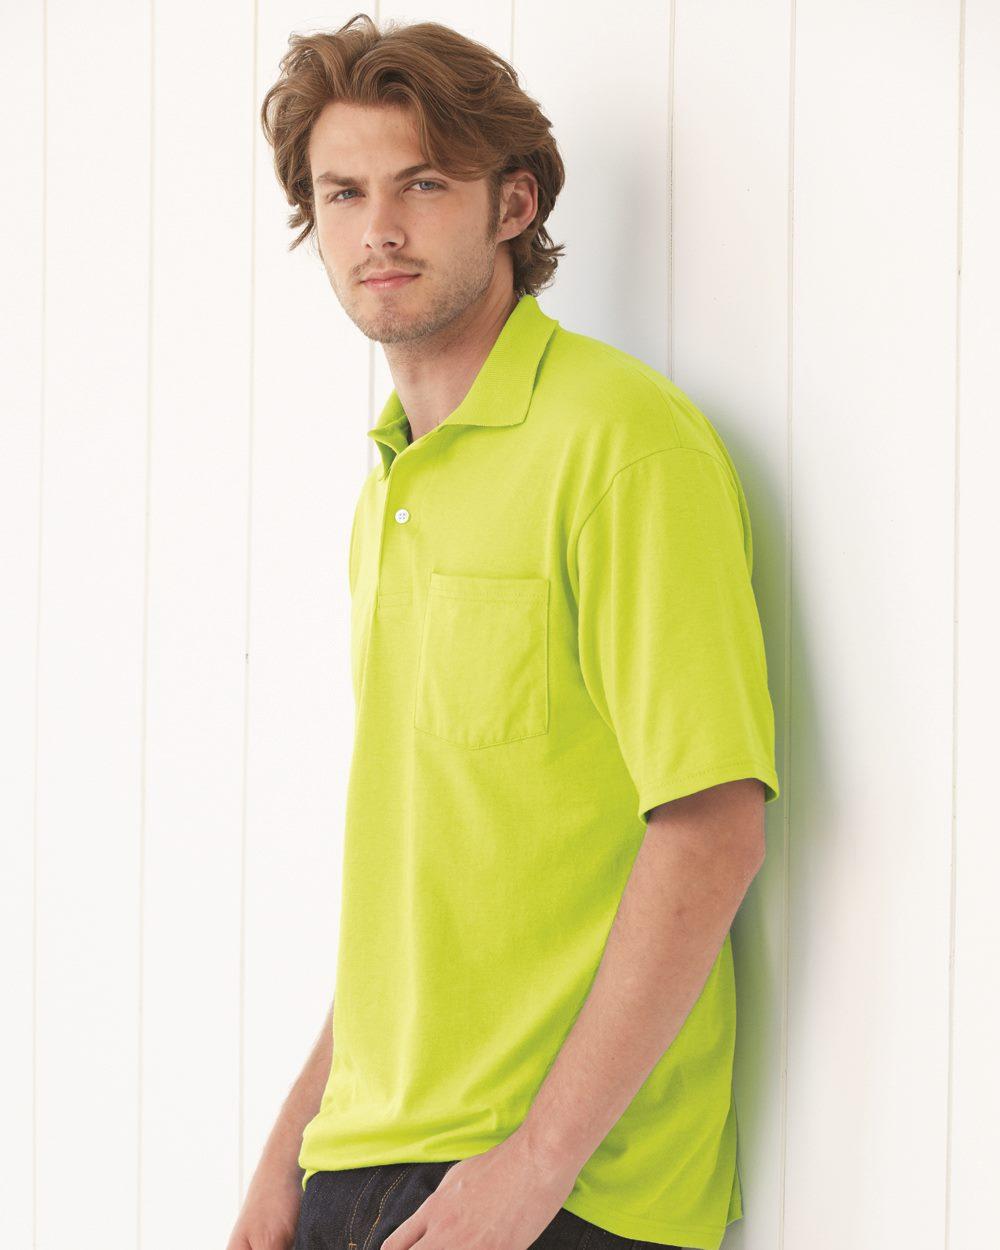 JERZEES 436MPR - SpotShield 50/50 Sport Shirt with a Pocket